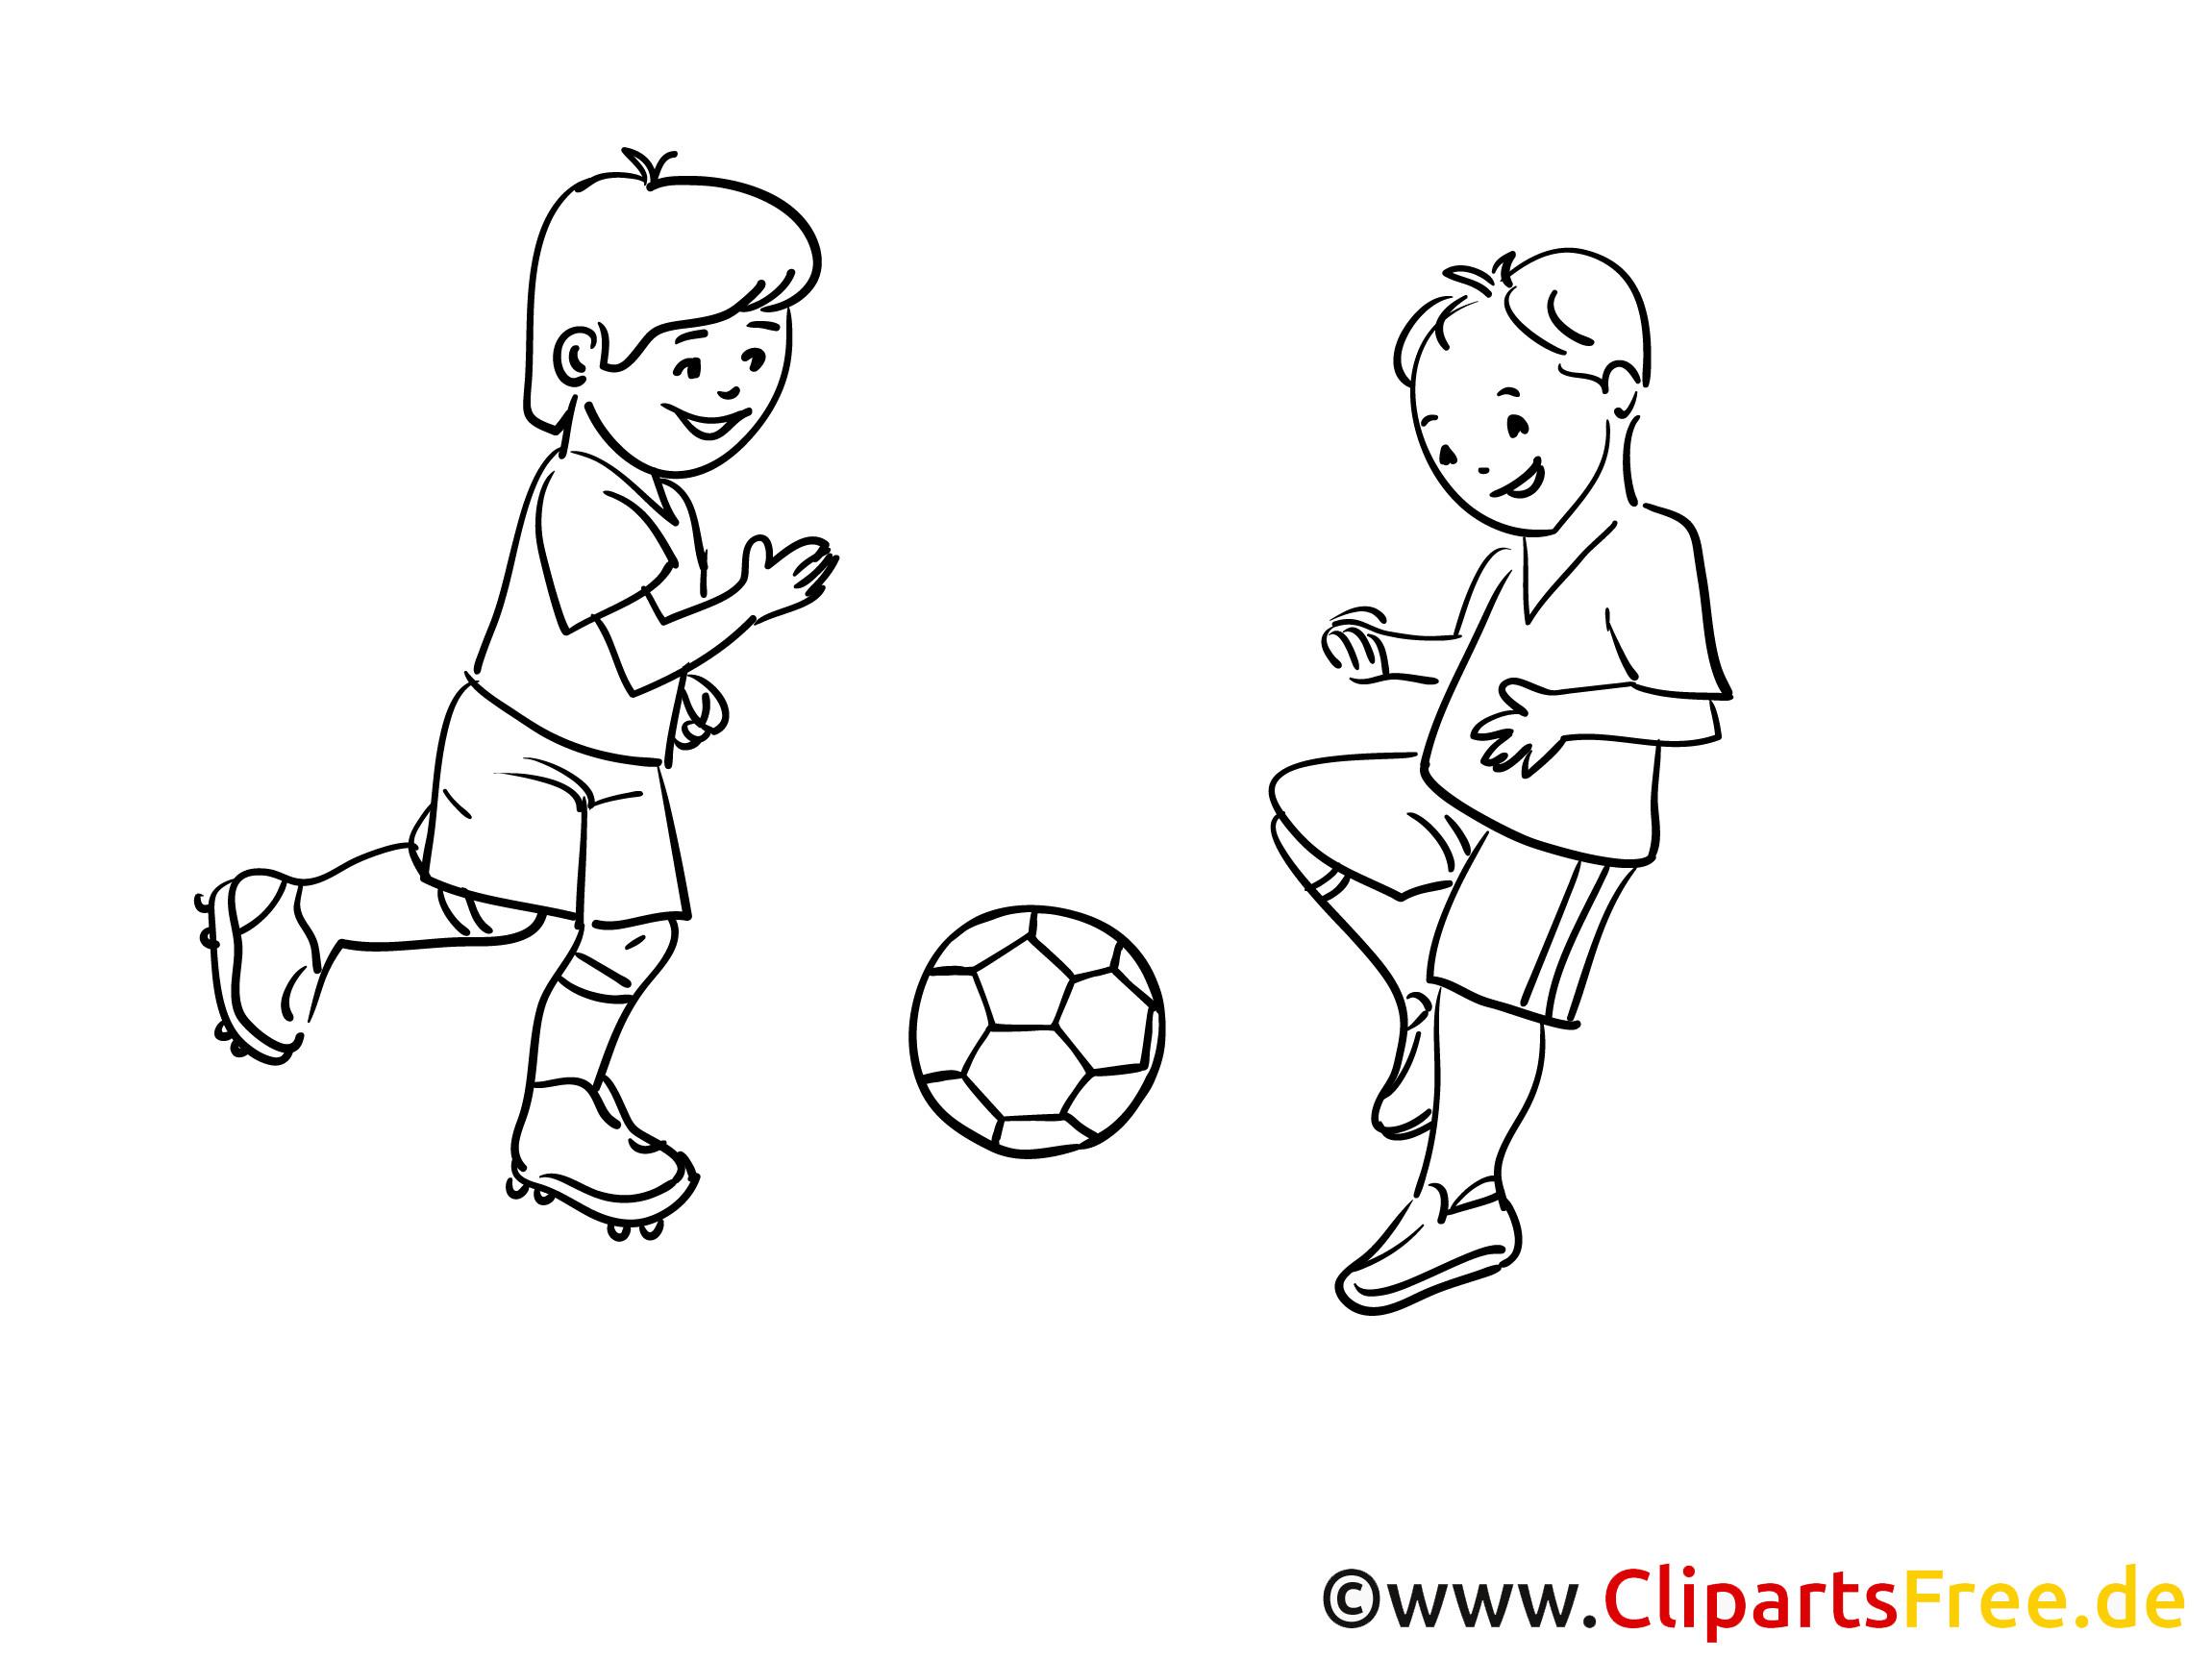 Beste 20 Ausmalbilder Fussball - Beste Wohnkultur ...